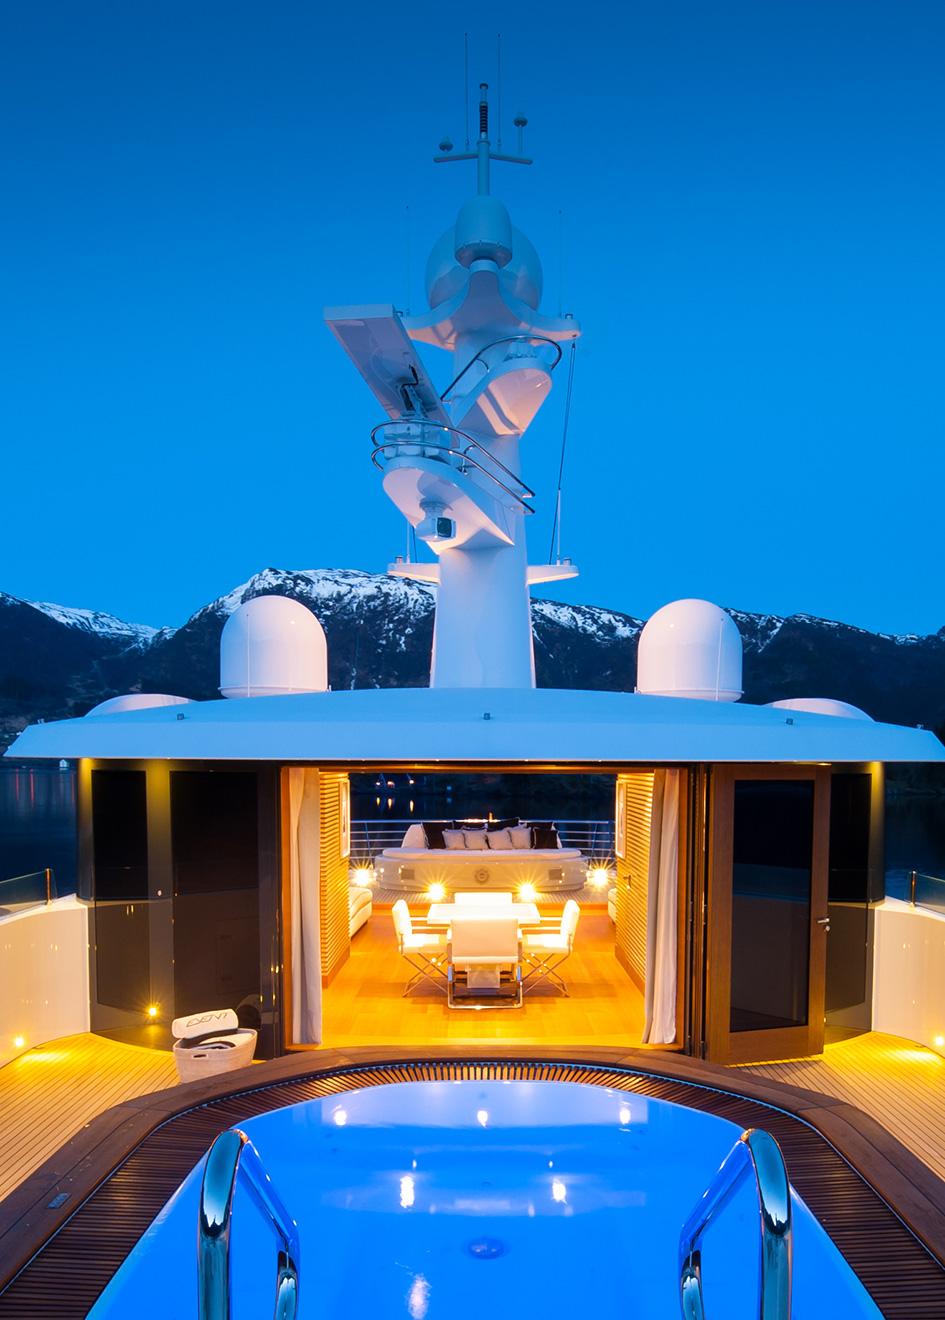 Portrait Event Yacht Spa Tub Night